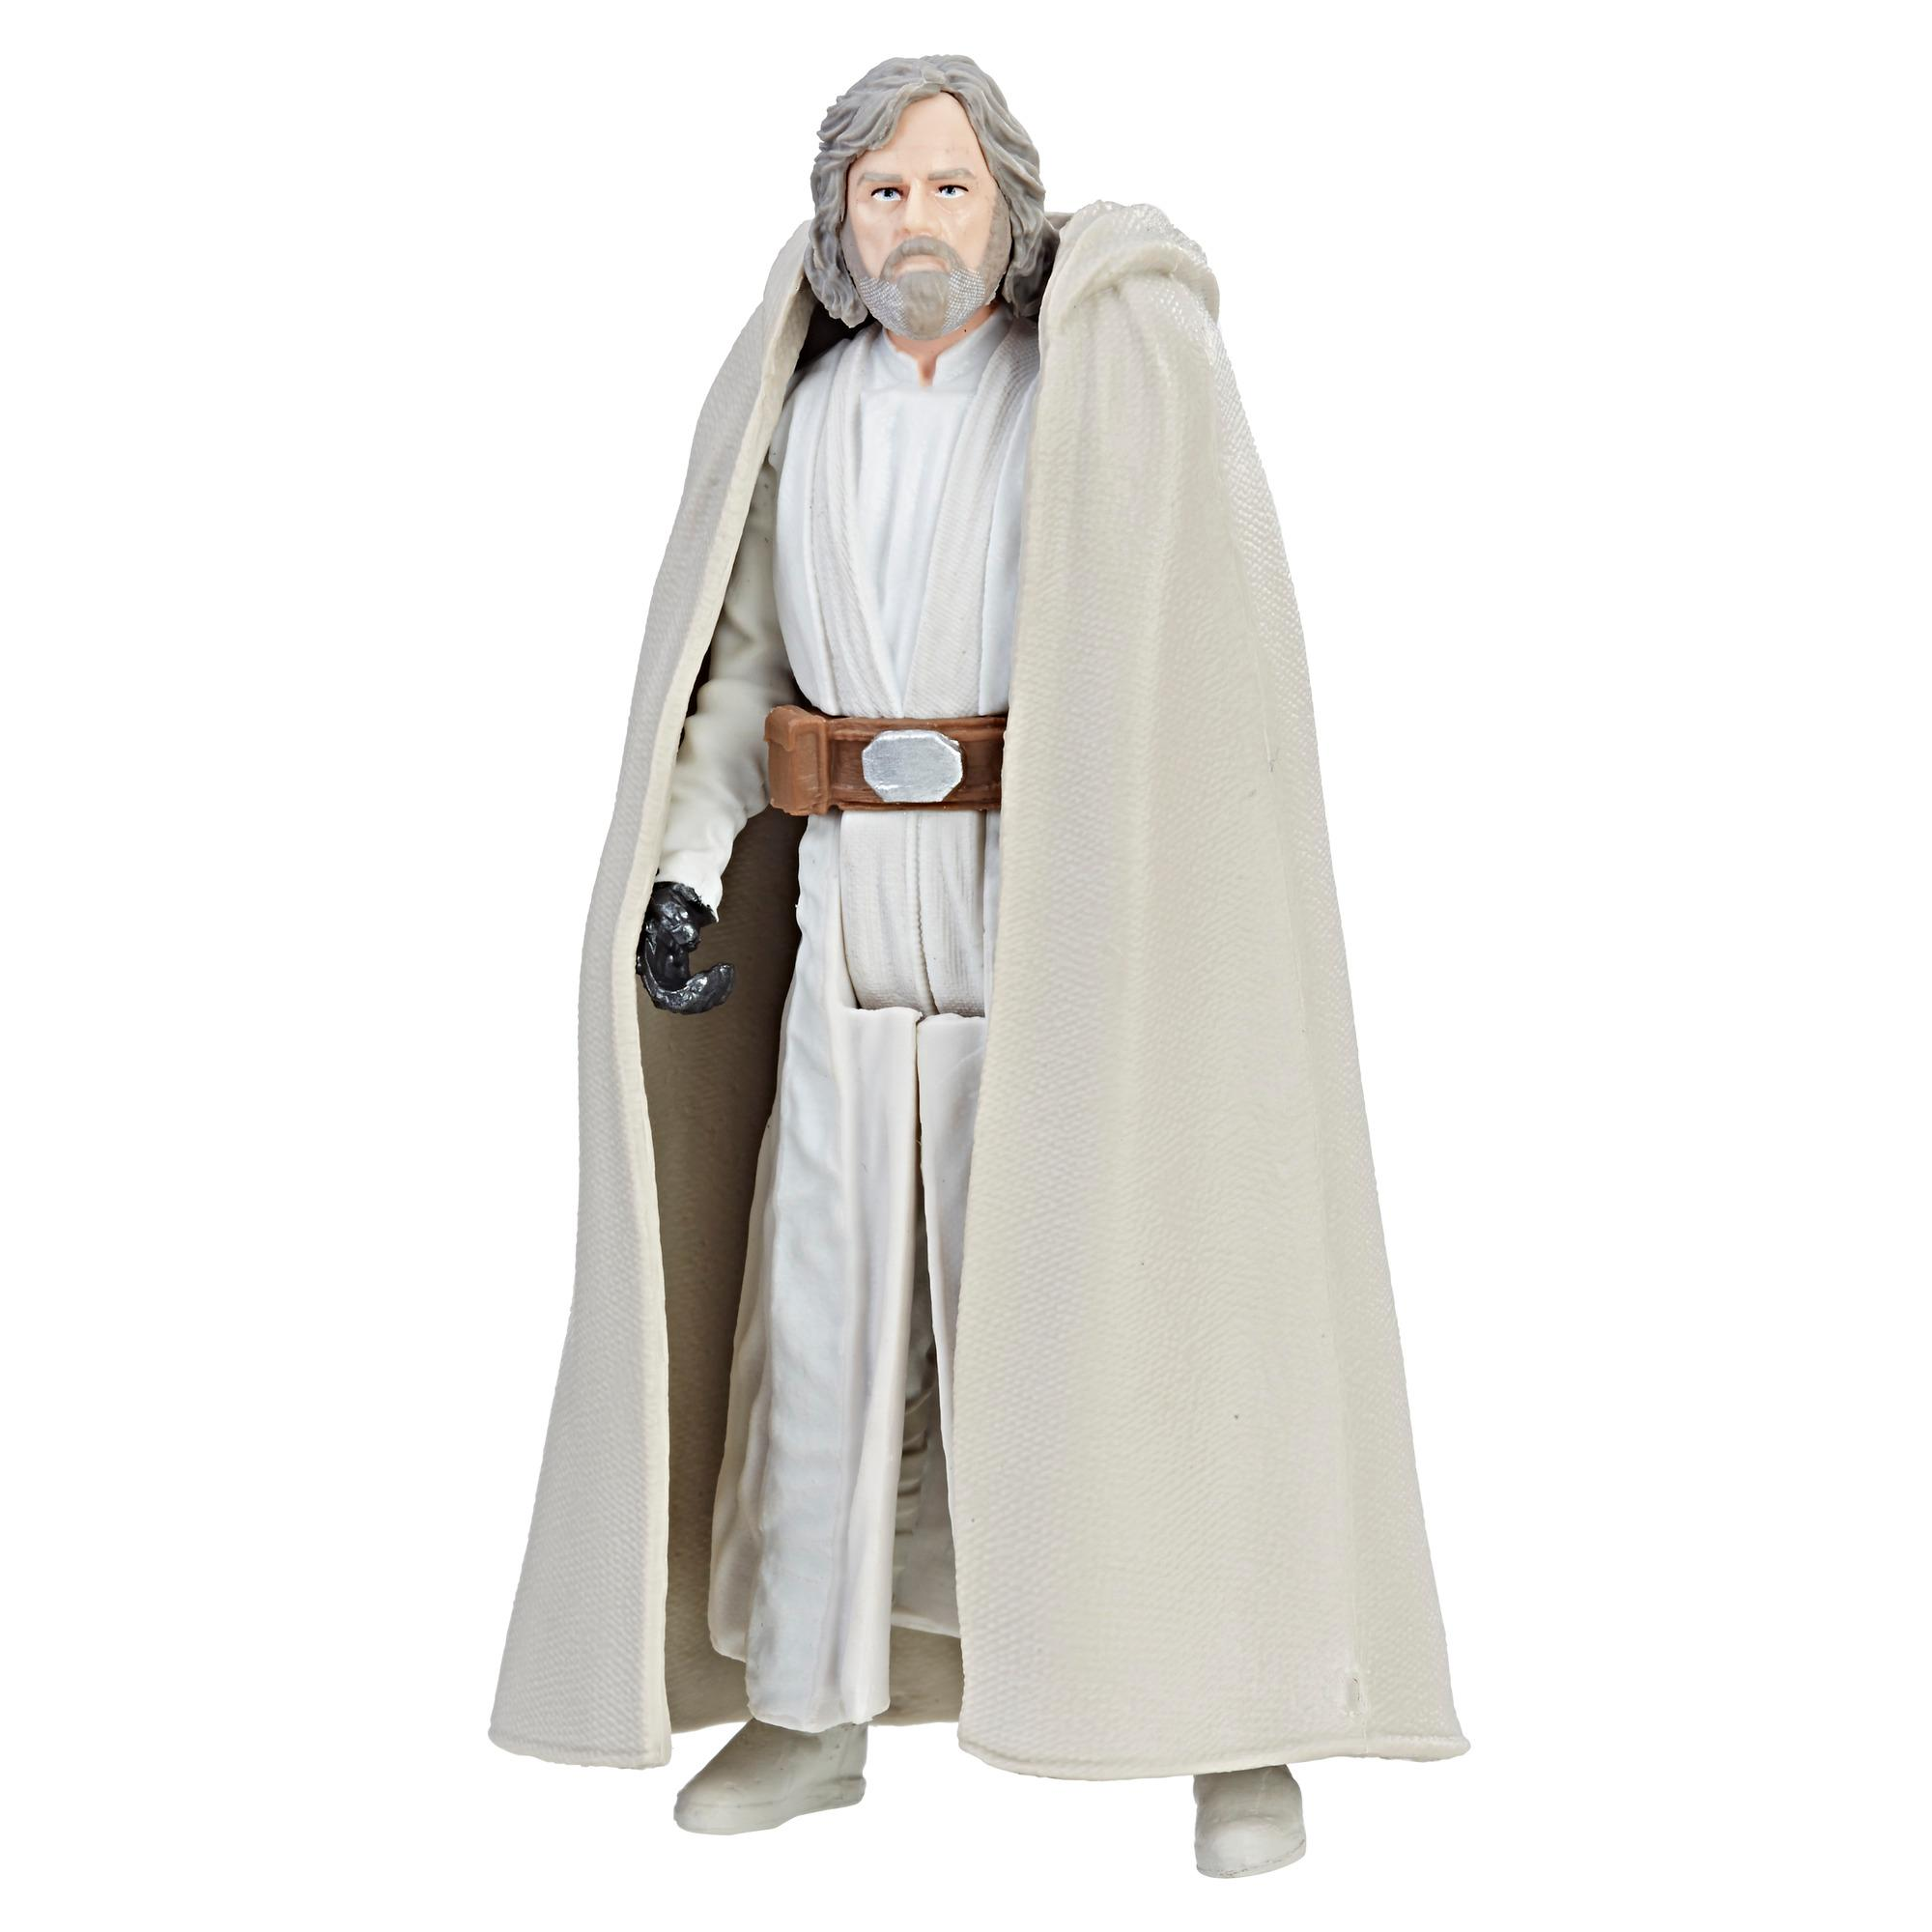 Personaggio Luke Skywalker Force Link (Maestro Jedi) da Star Wars